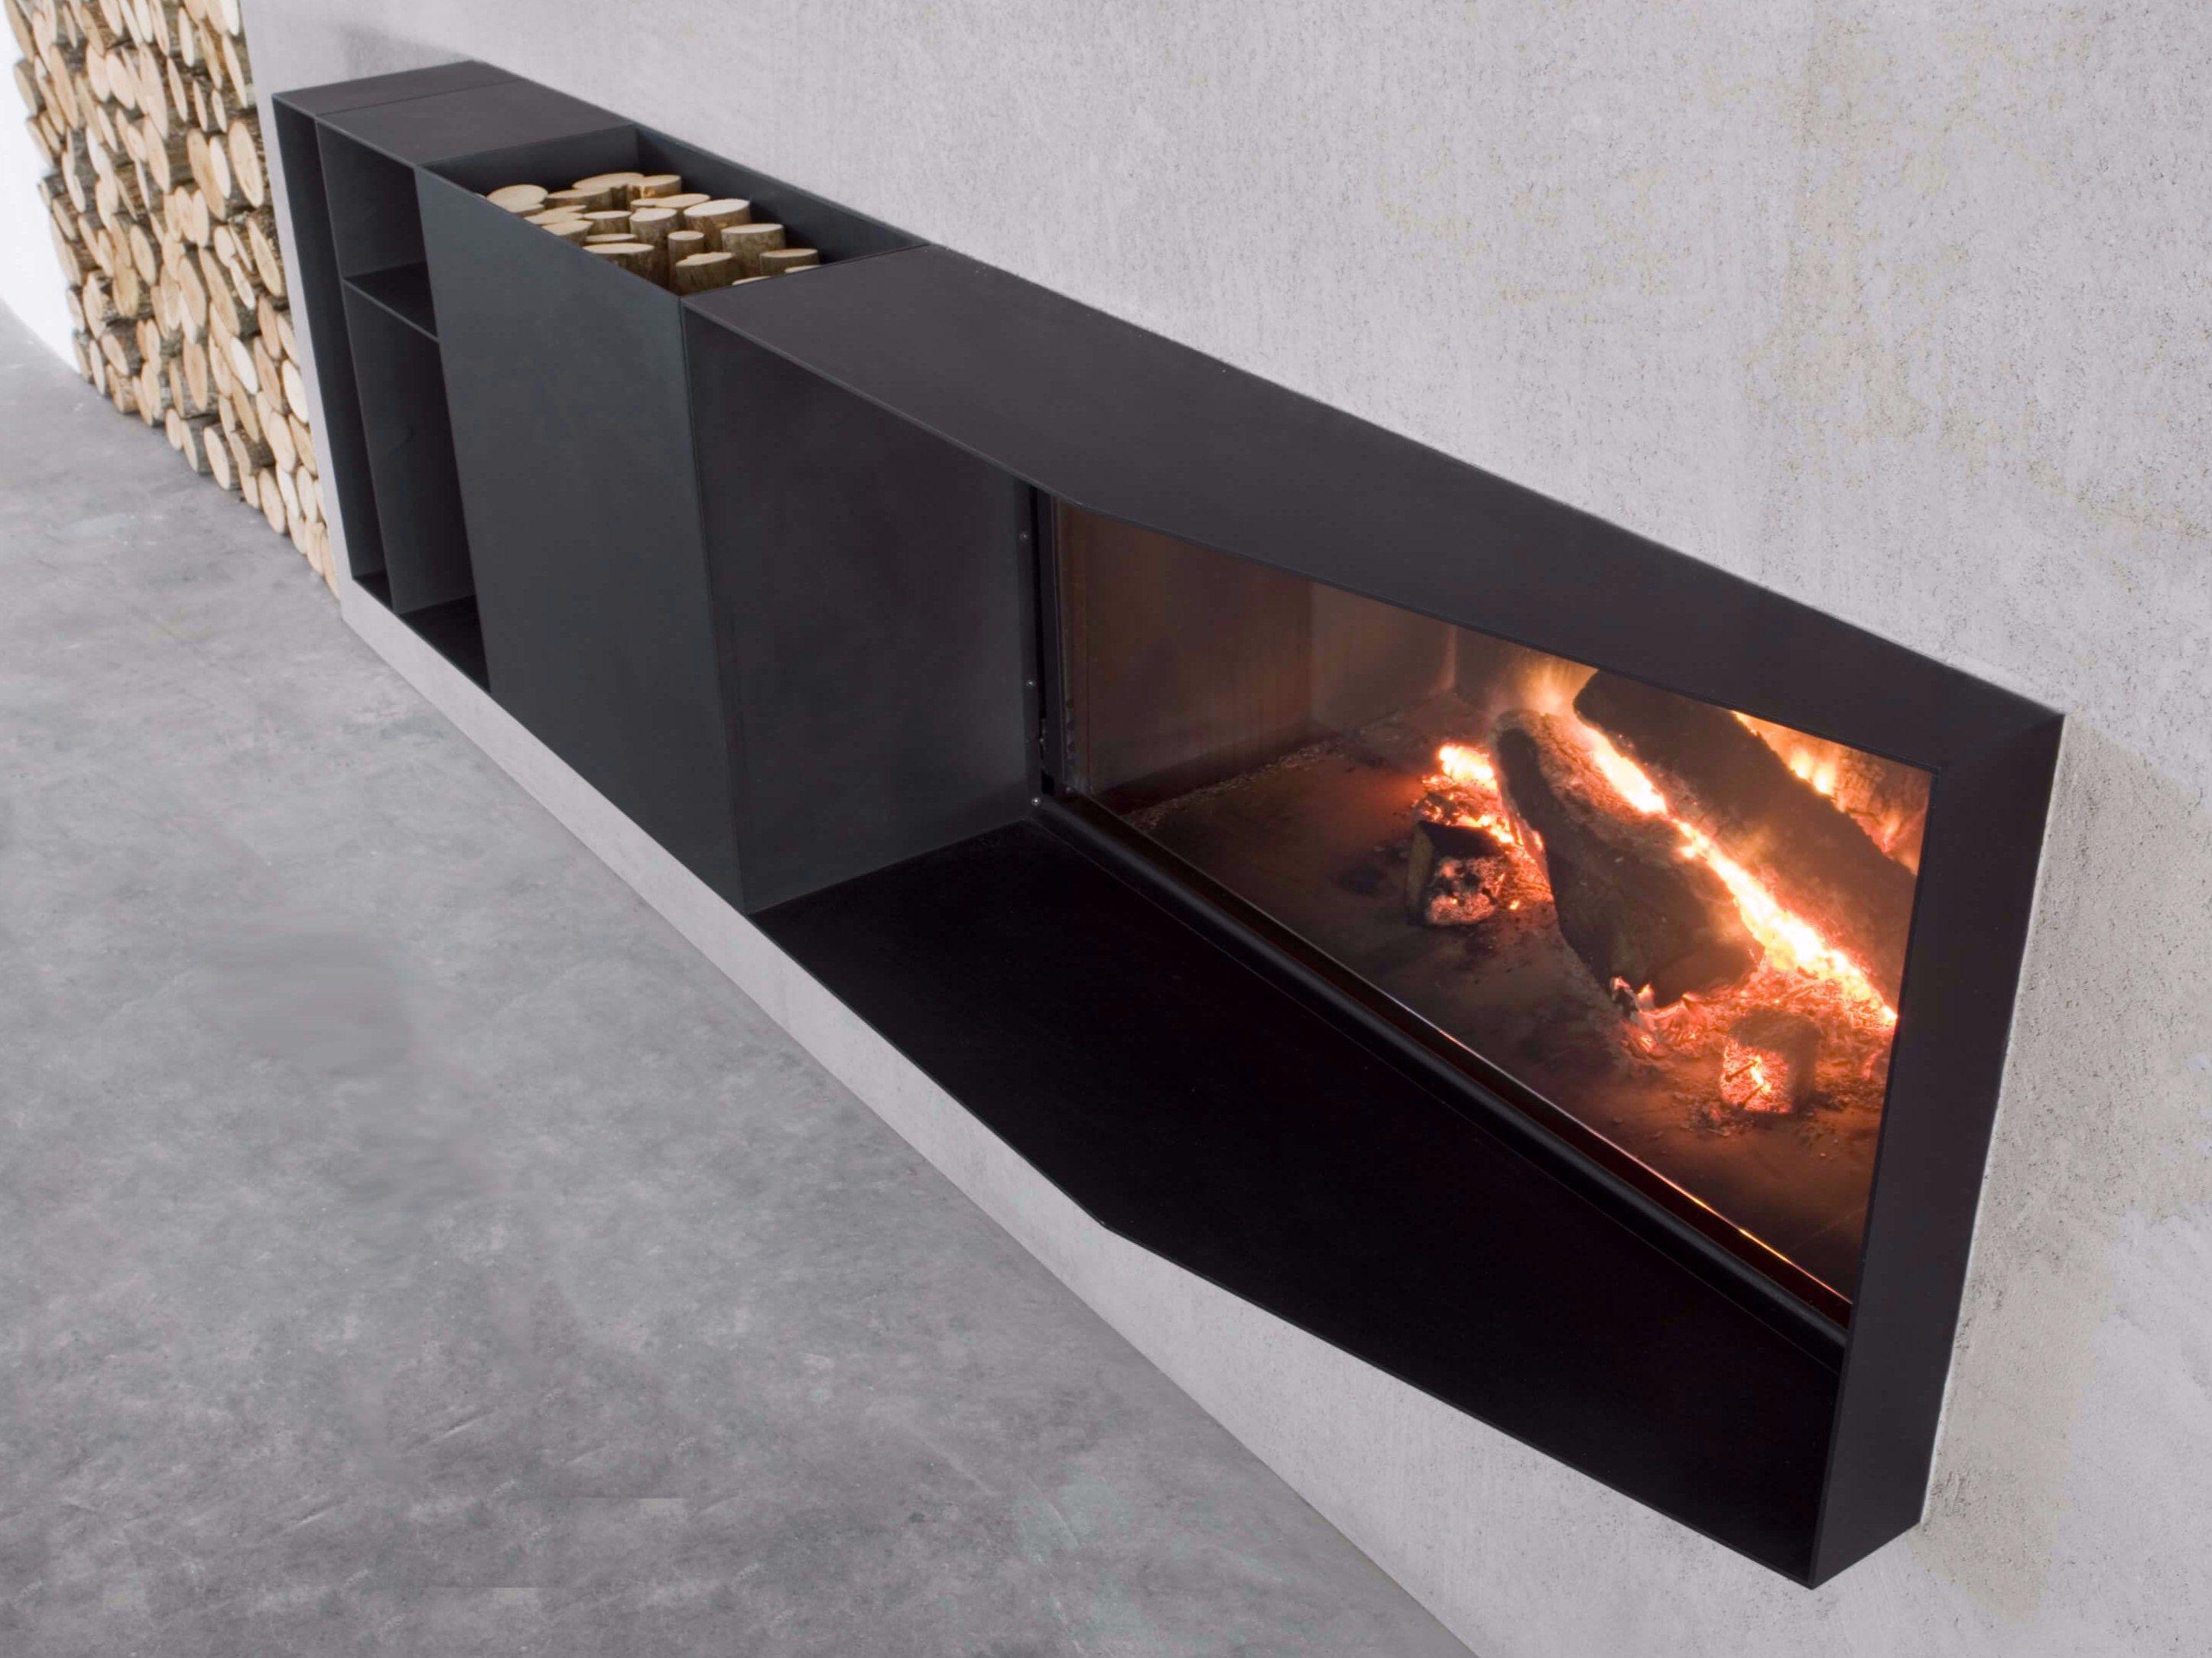 Ceresoli centro del calore vendita stufe a legna stufe - Stufe a legna design ...